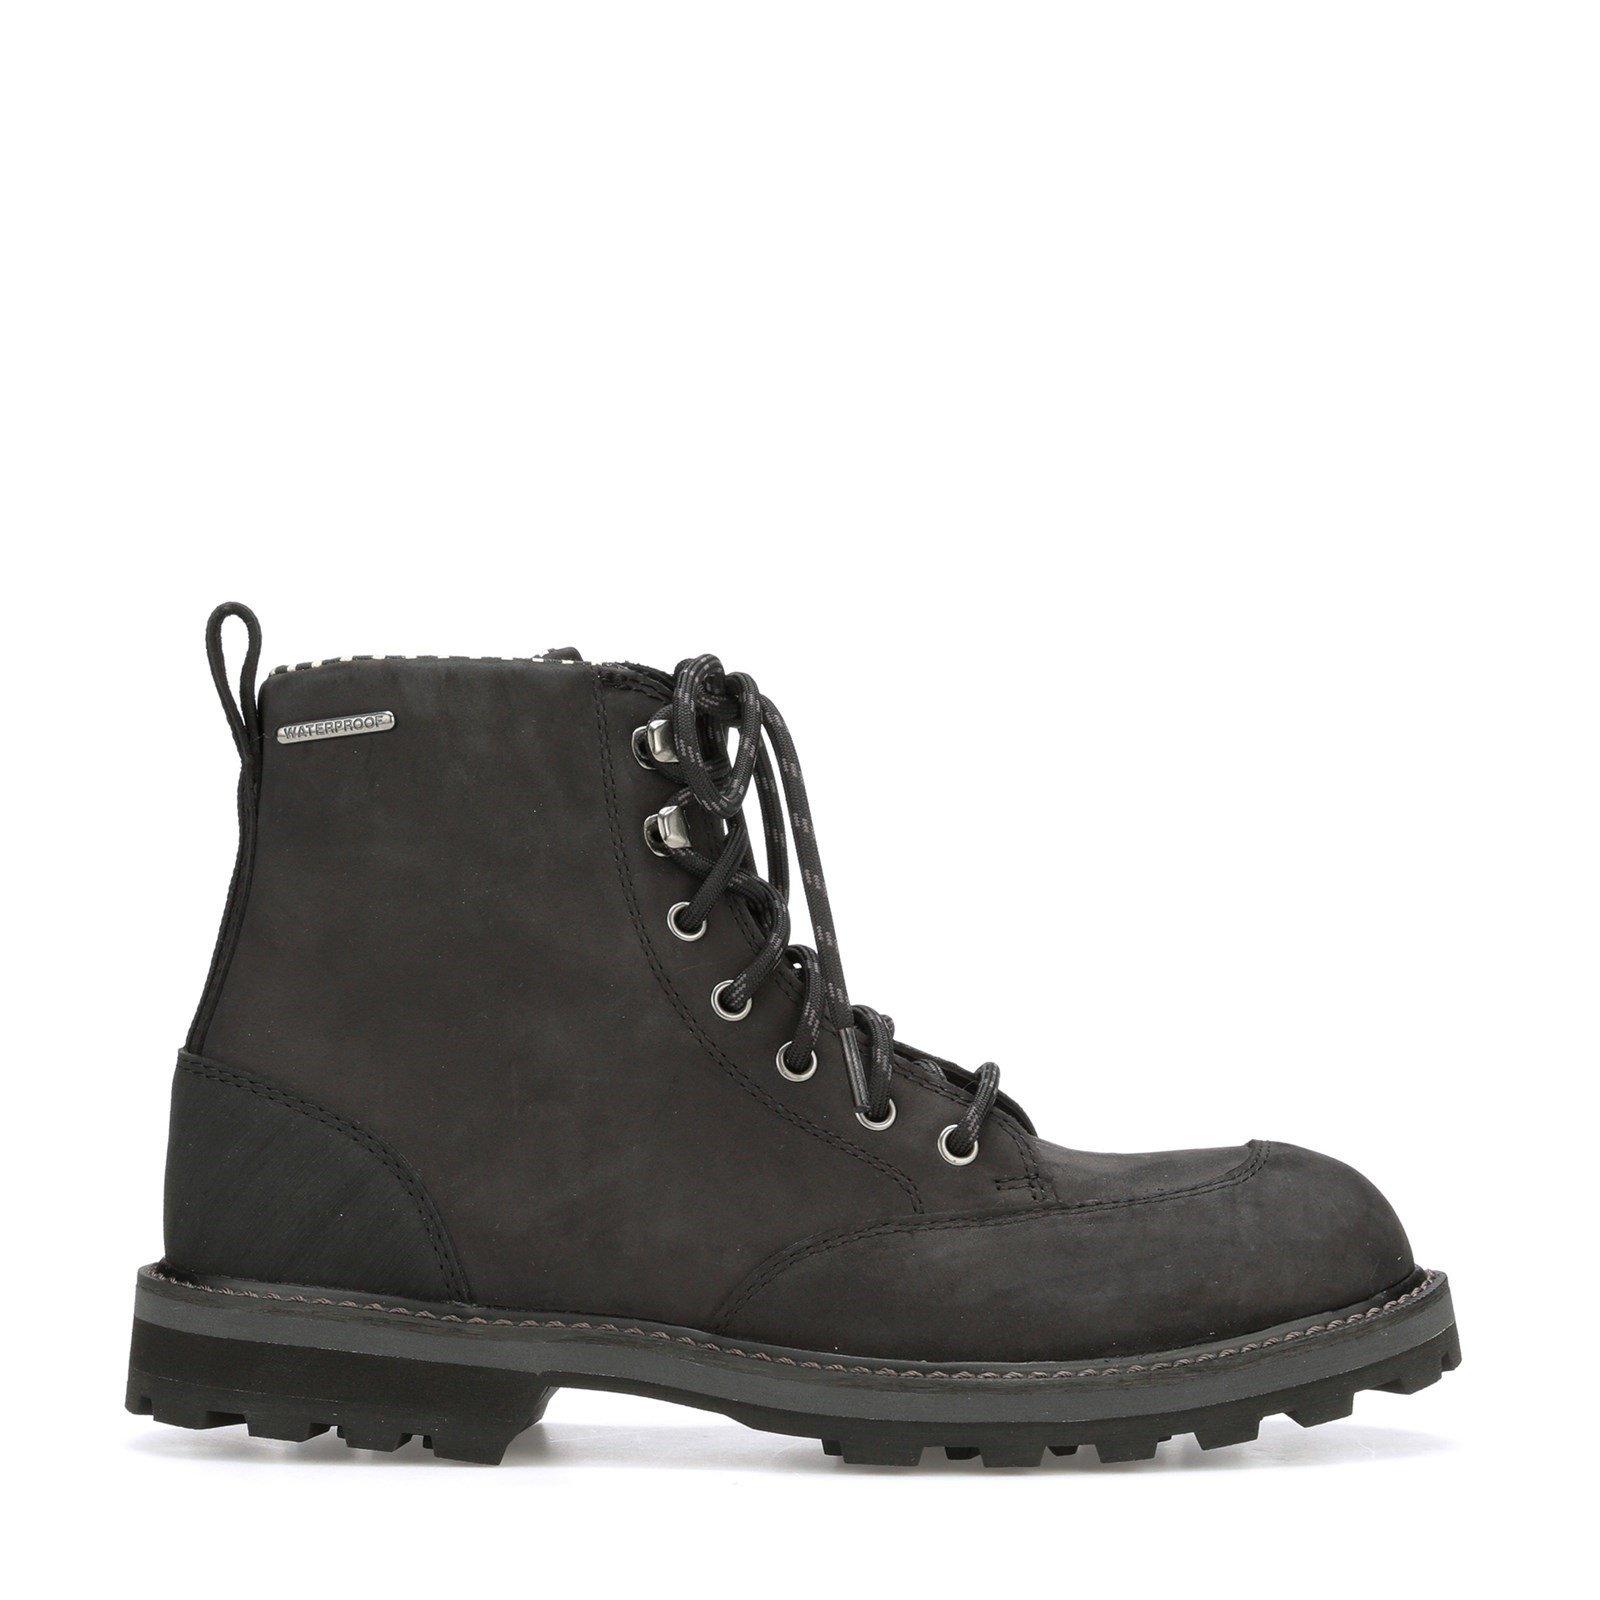 Muck Boots Men's Foreman Boot Black 31854 - Black 6